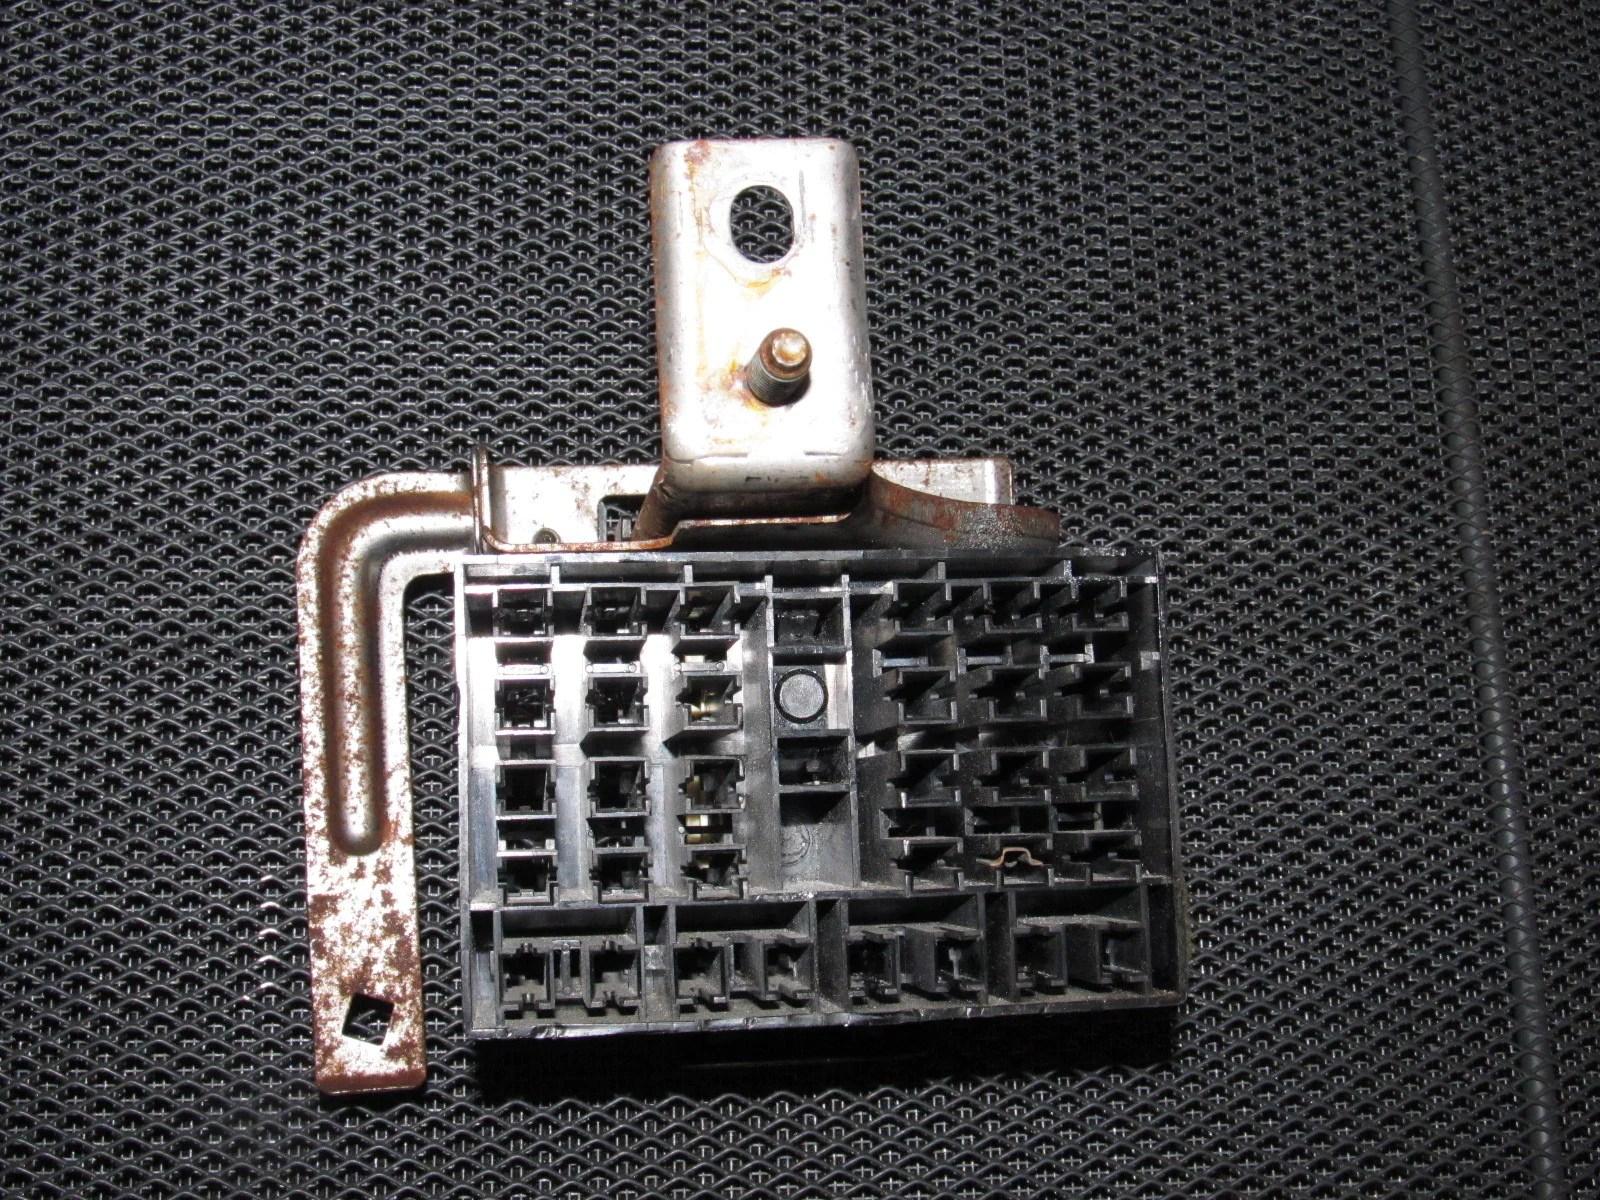 94 95 96 97 mazda miata oem interior fuse box  [ 1600 x 1200 Pixel ]